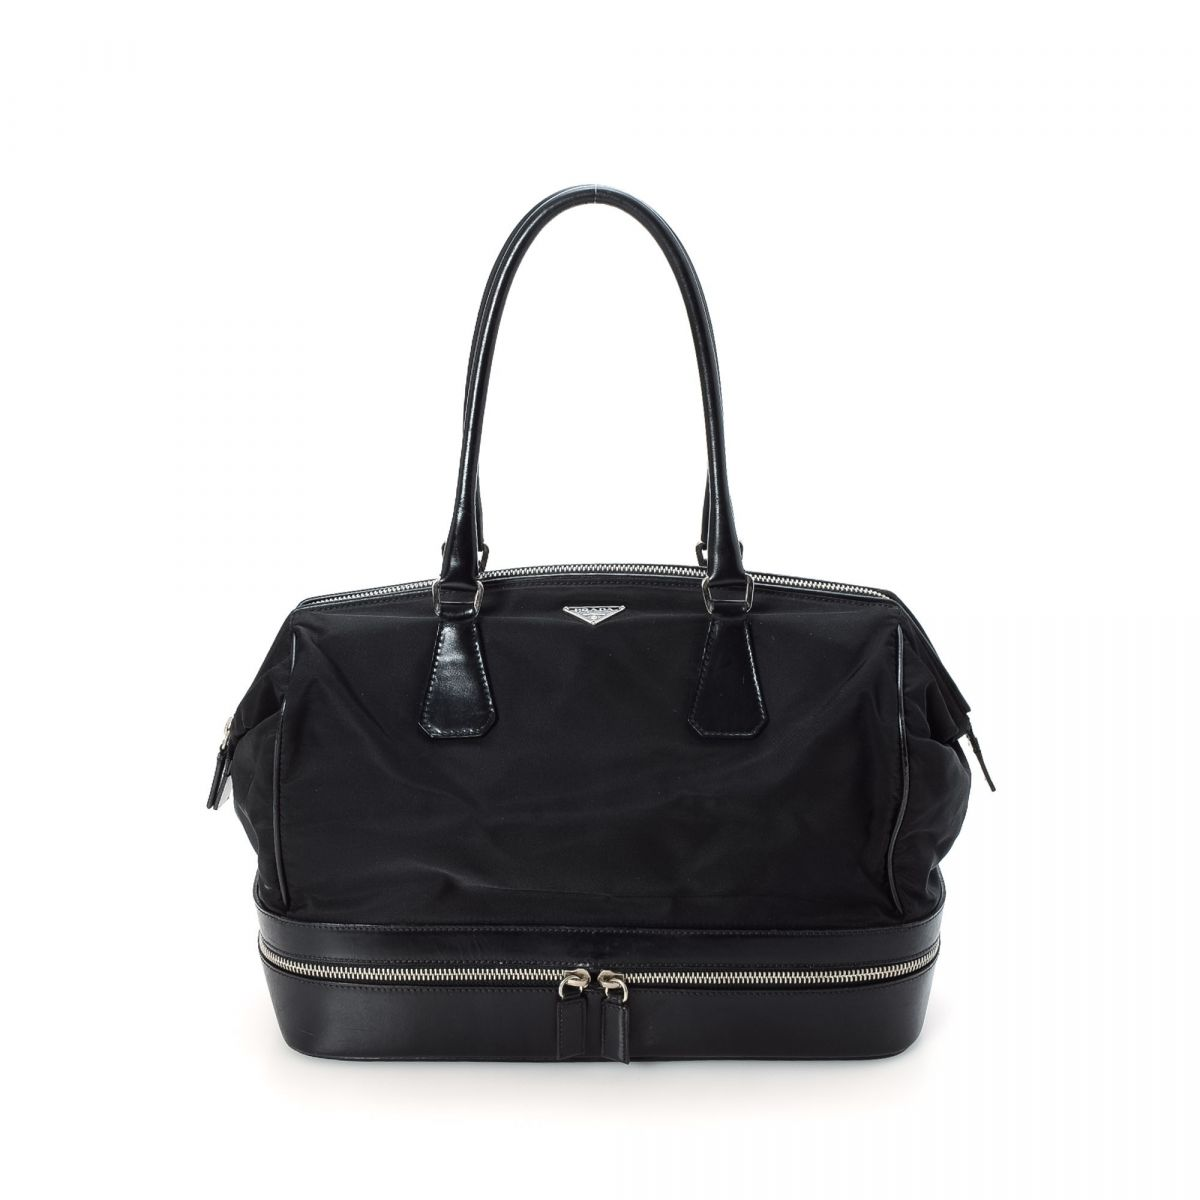 9d9261b8d0aa prada tessuto hobo bag nylon lxrandco pre owned luxury vintage ...